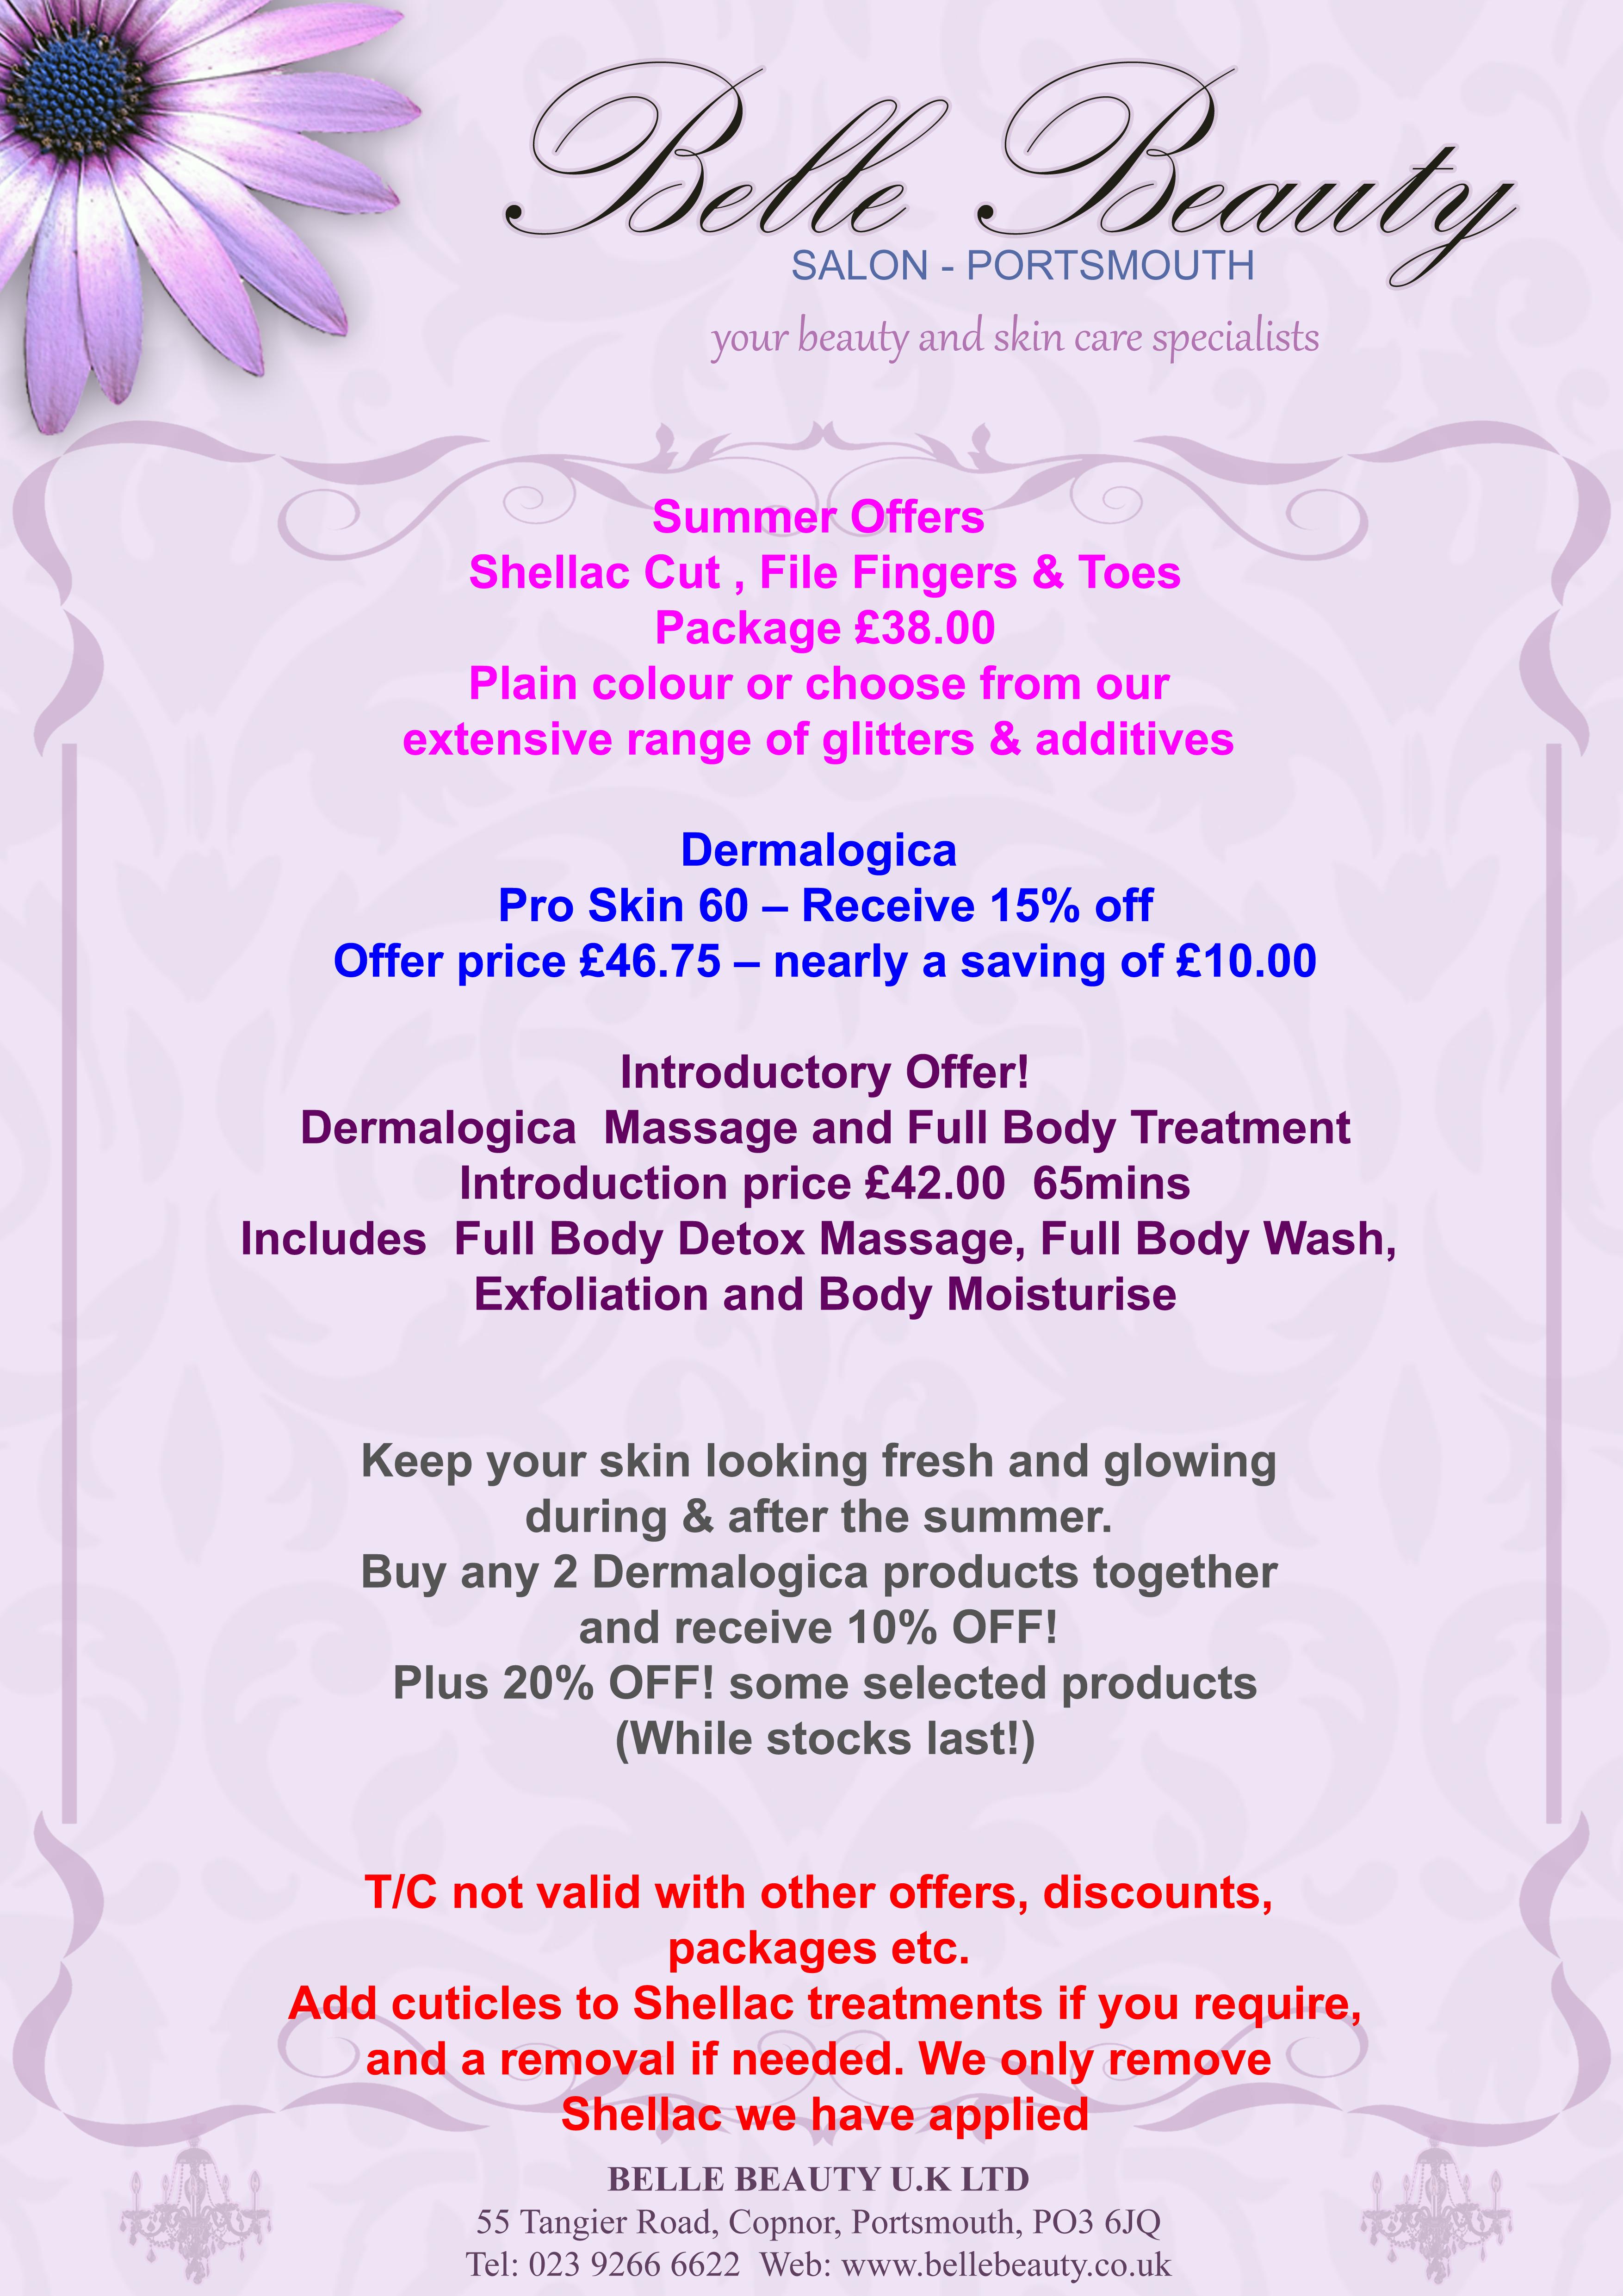 BEAUTY SALON | Belle Beauty Portsmouth, Treatments, Massage